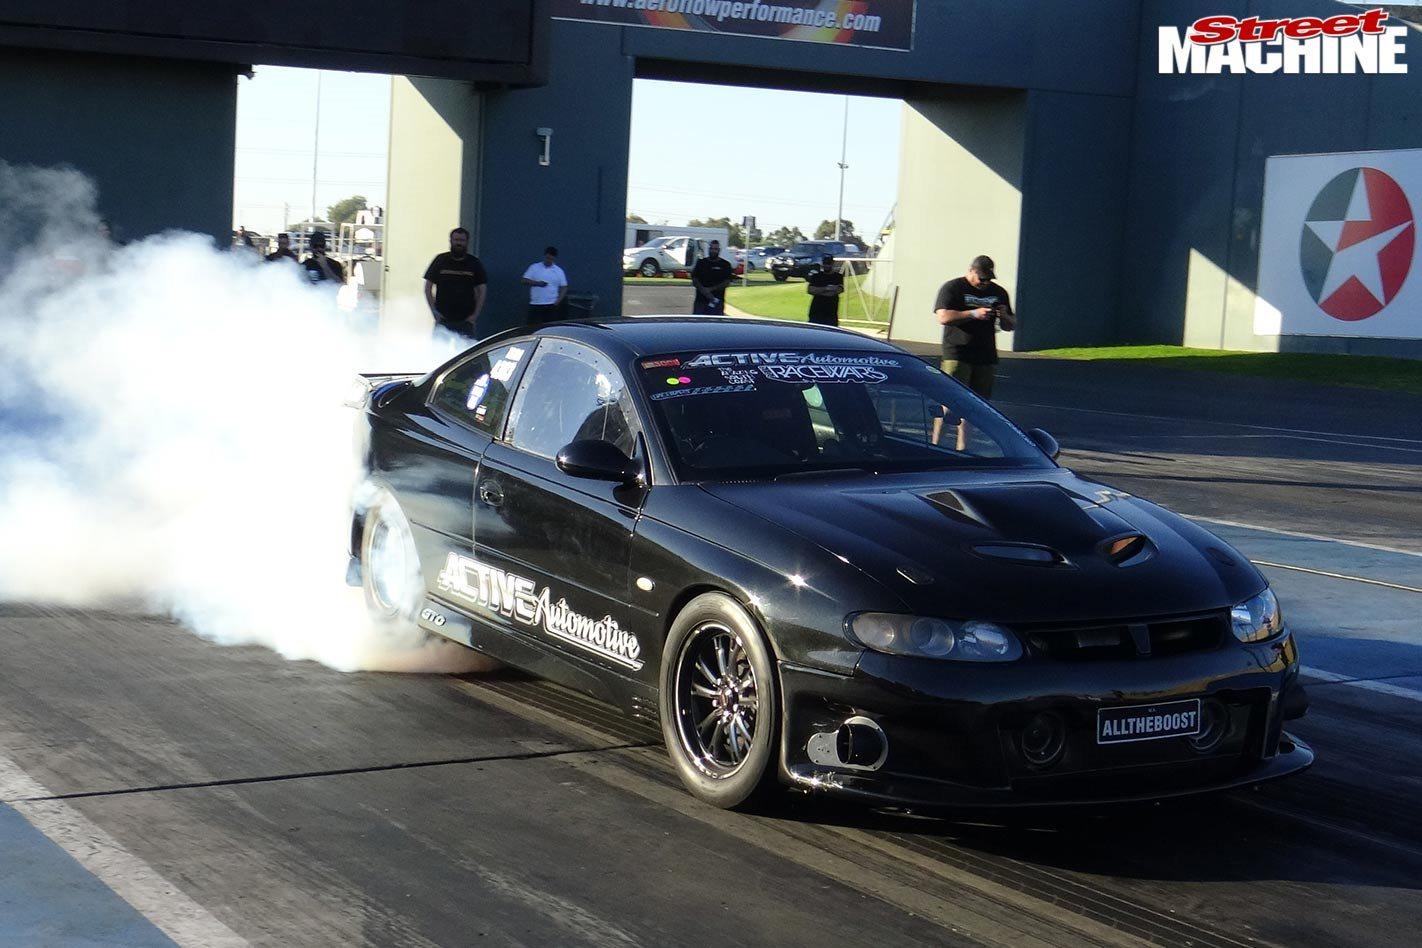 Eddy Tassone's twin-turbo HSV VZ GTO